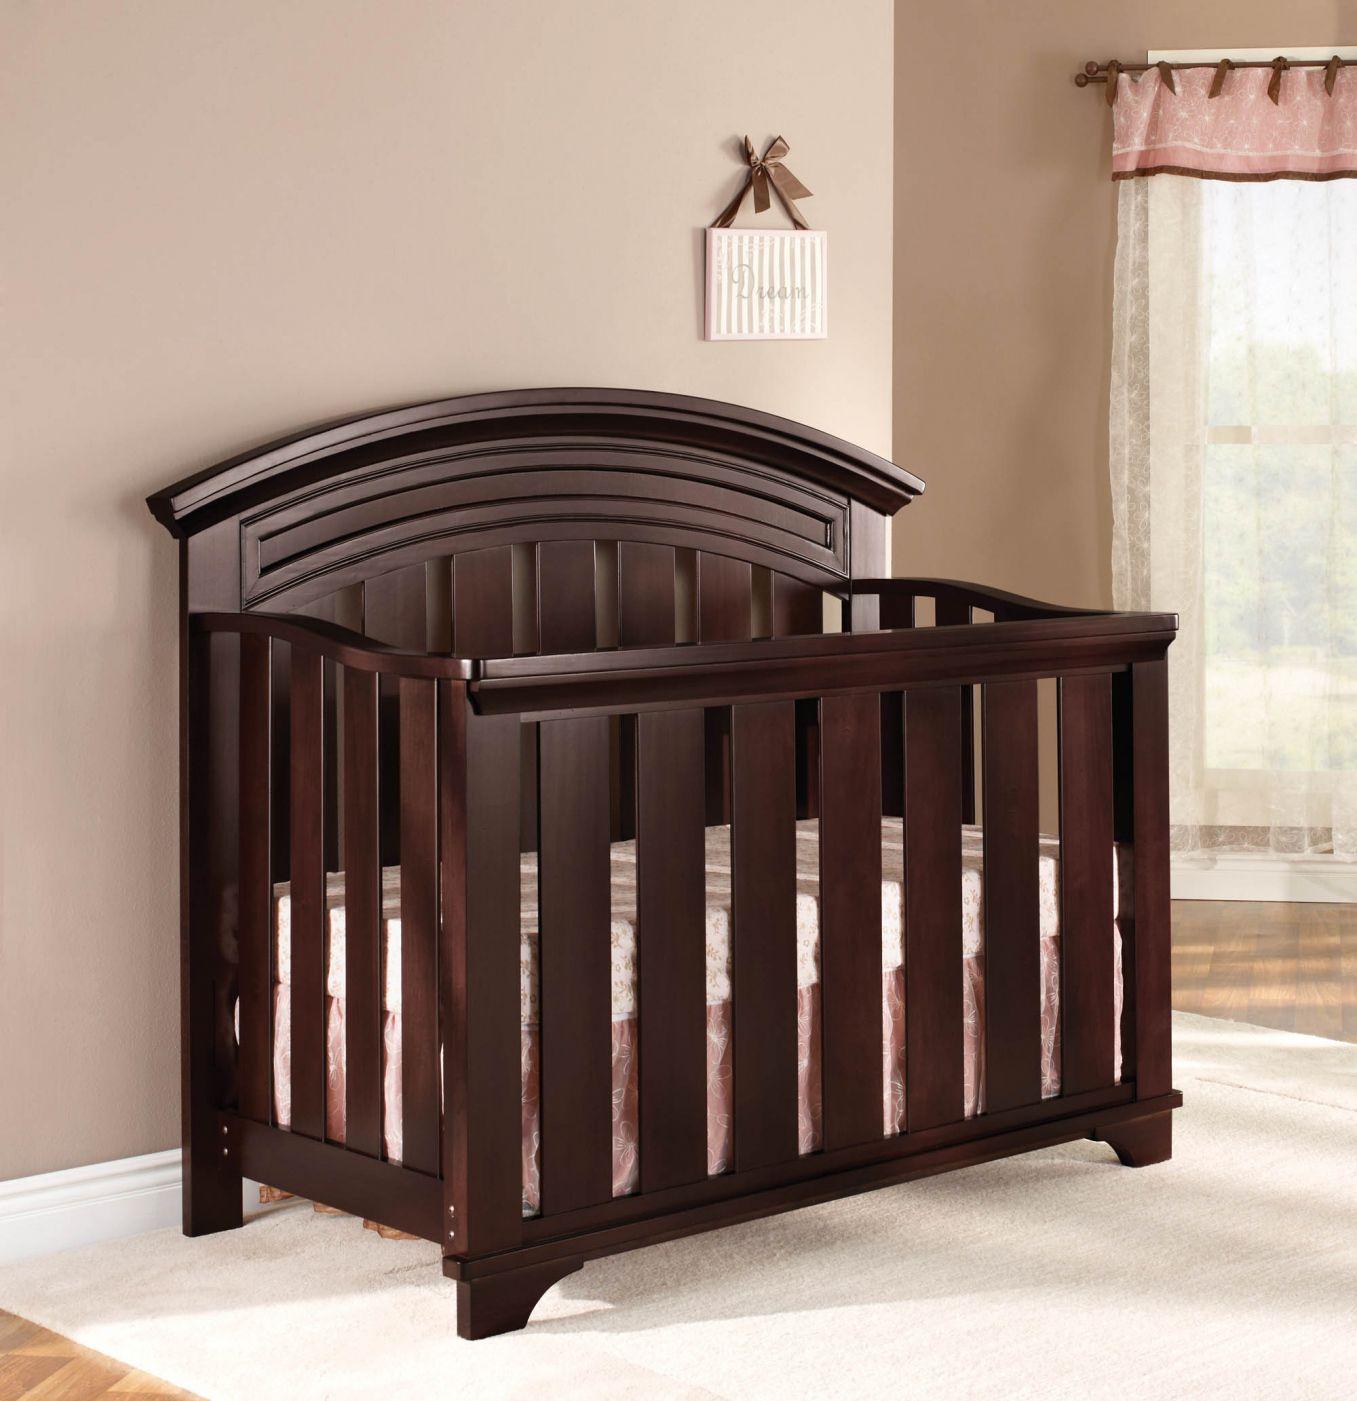 30 Westwood Baby Furniture Reviews - Interior Design ...